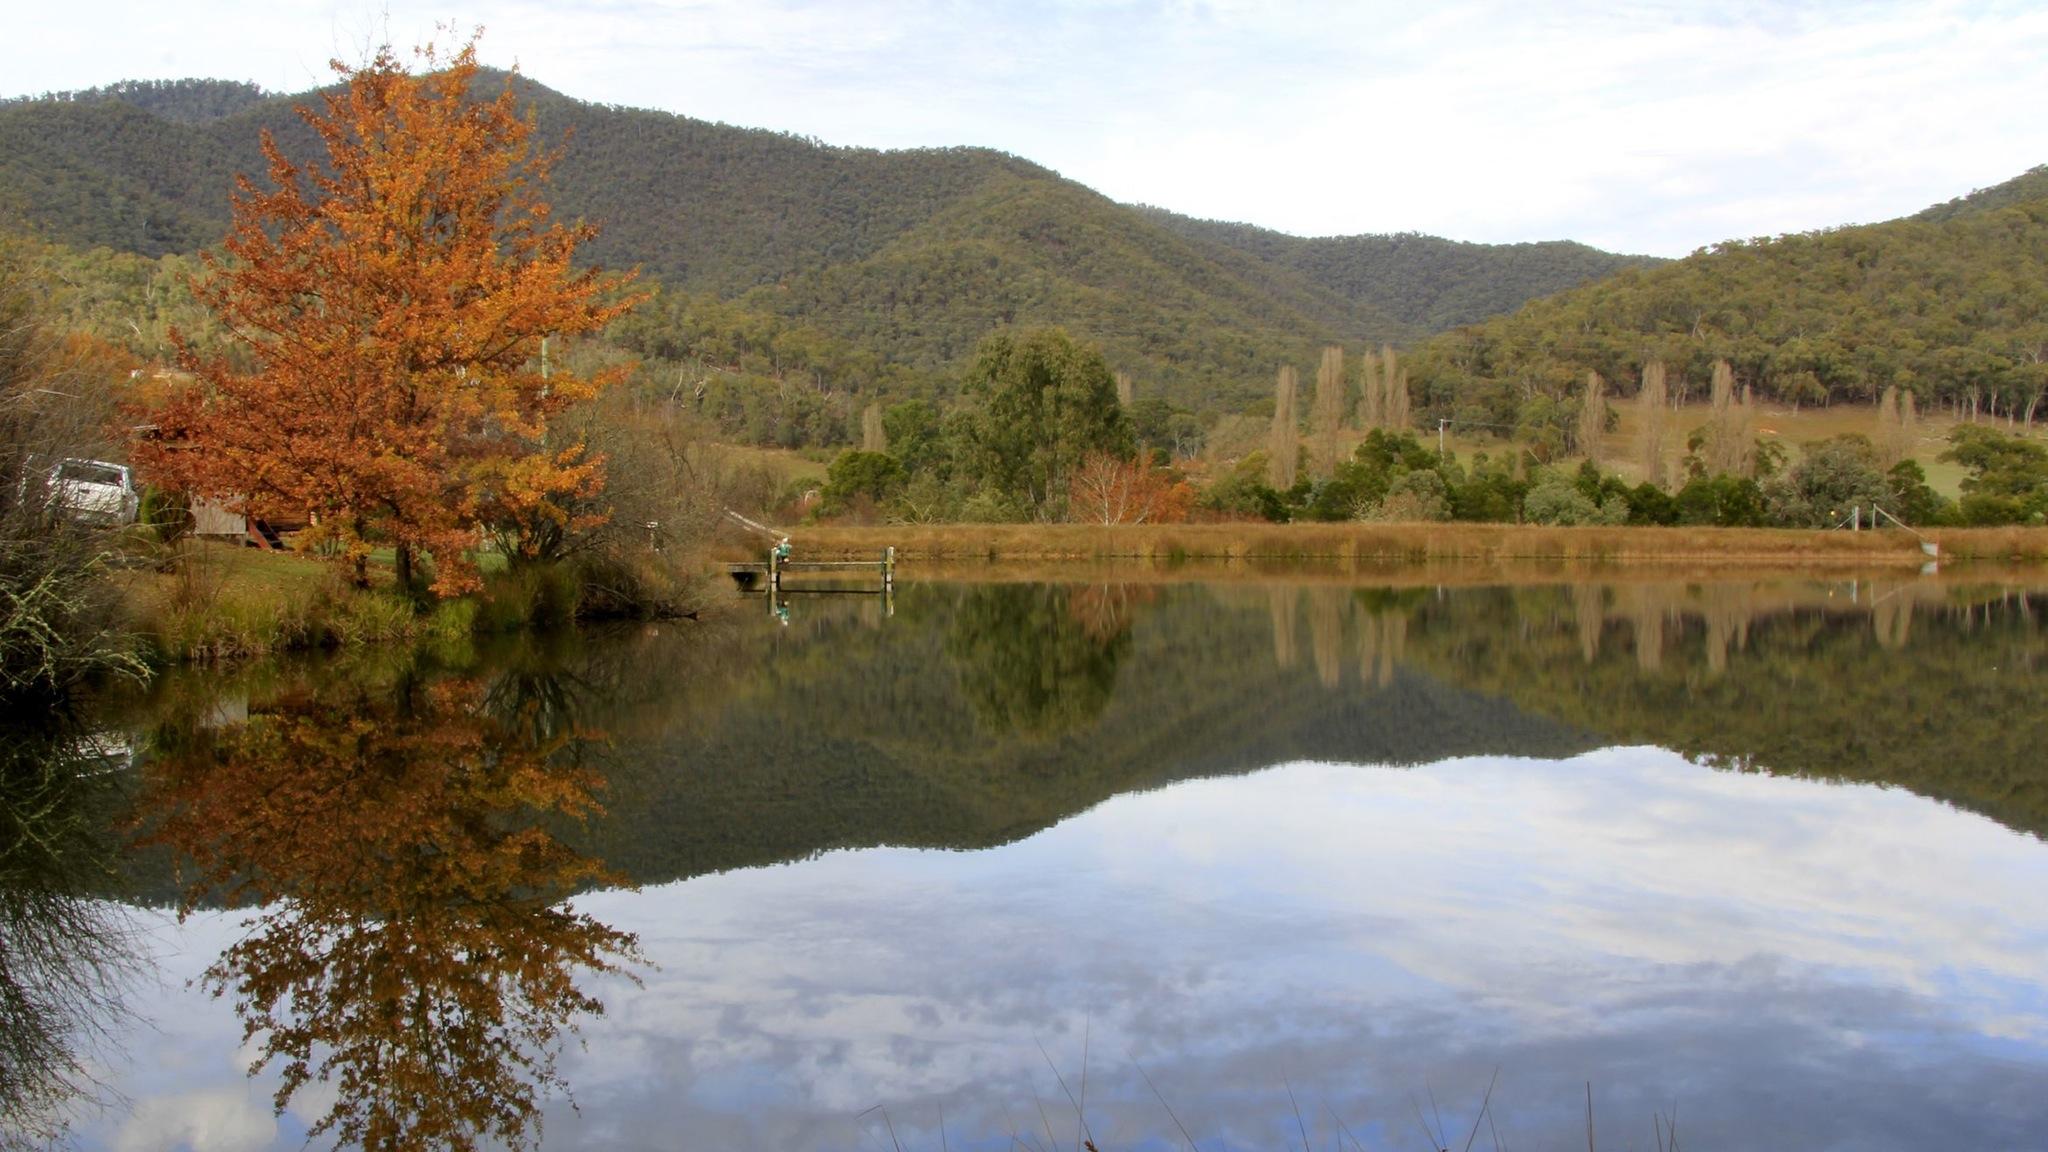 Mirror Lake in Jamieson Valley Retreat